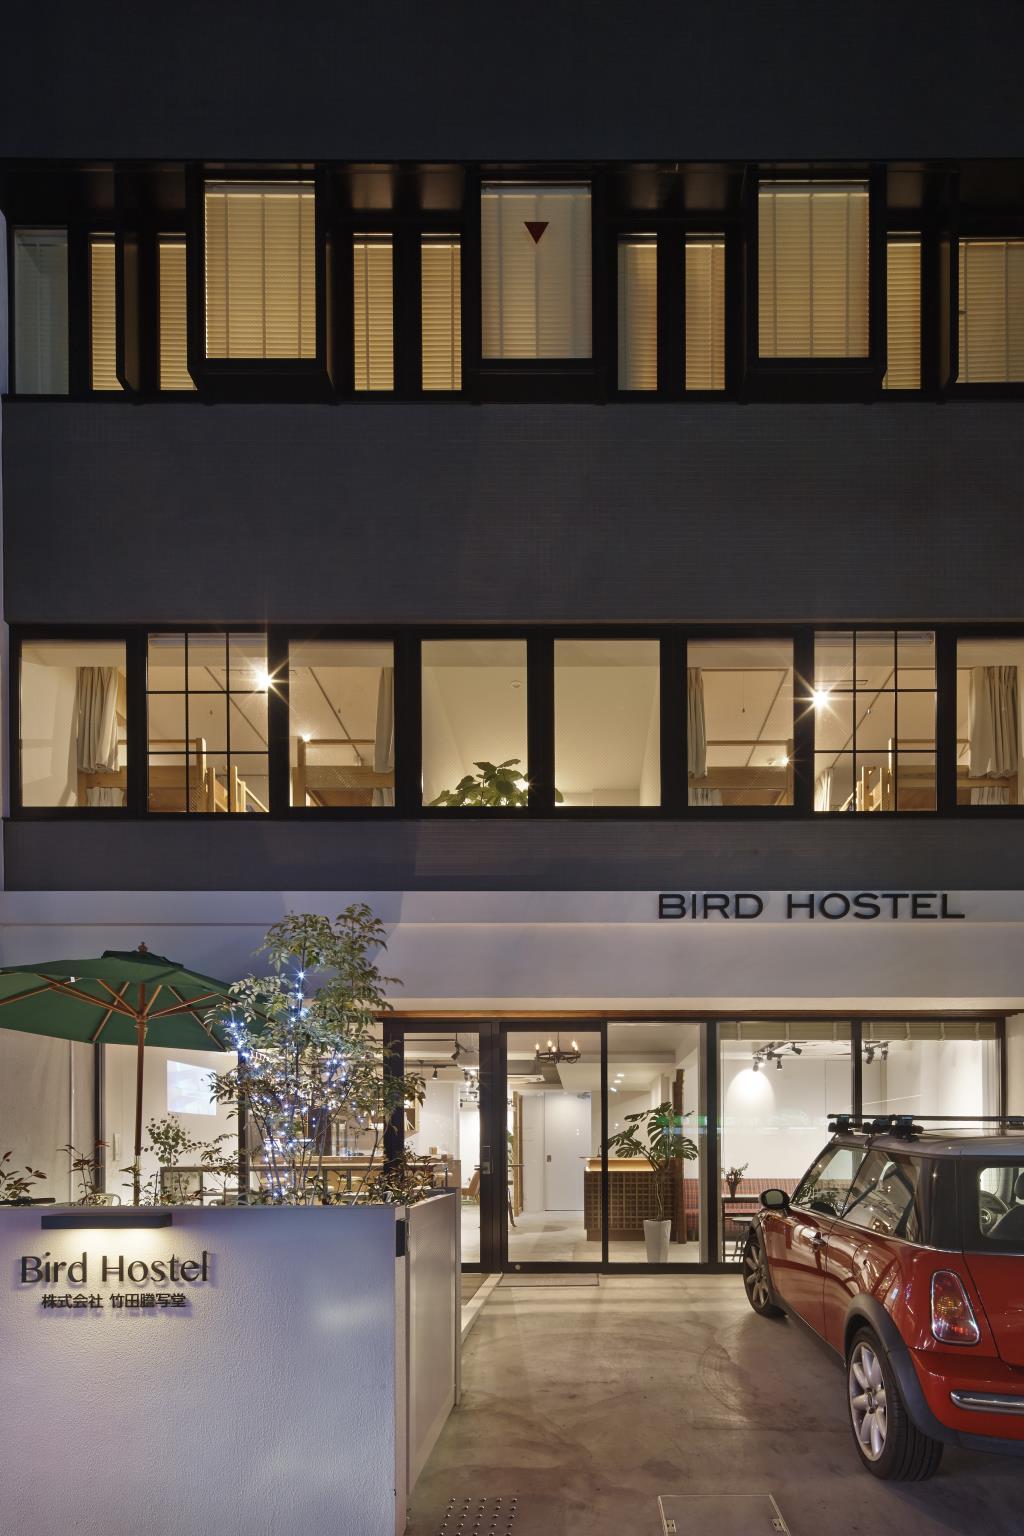 Bird Hostel